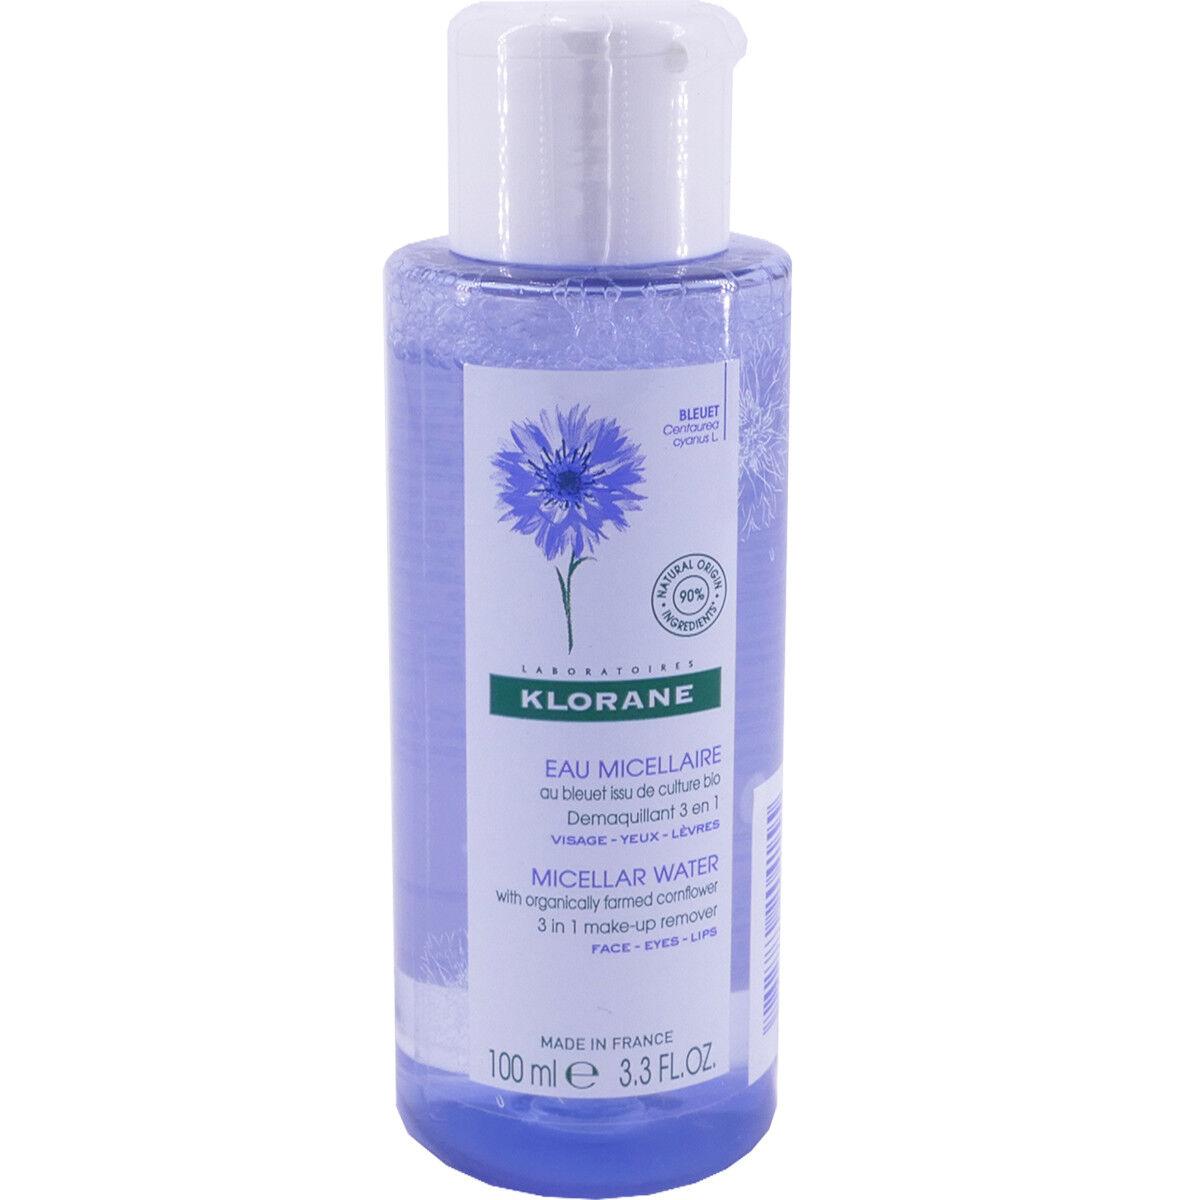 Klorane eau micellaire bleuet 100 ml